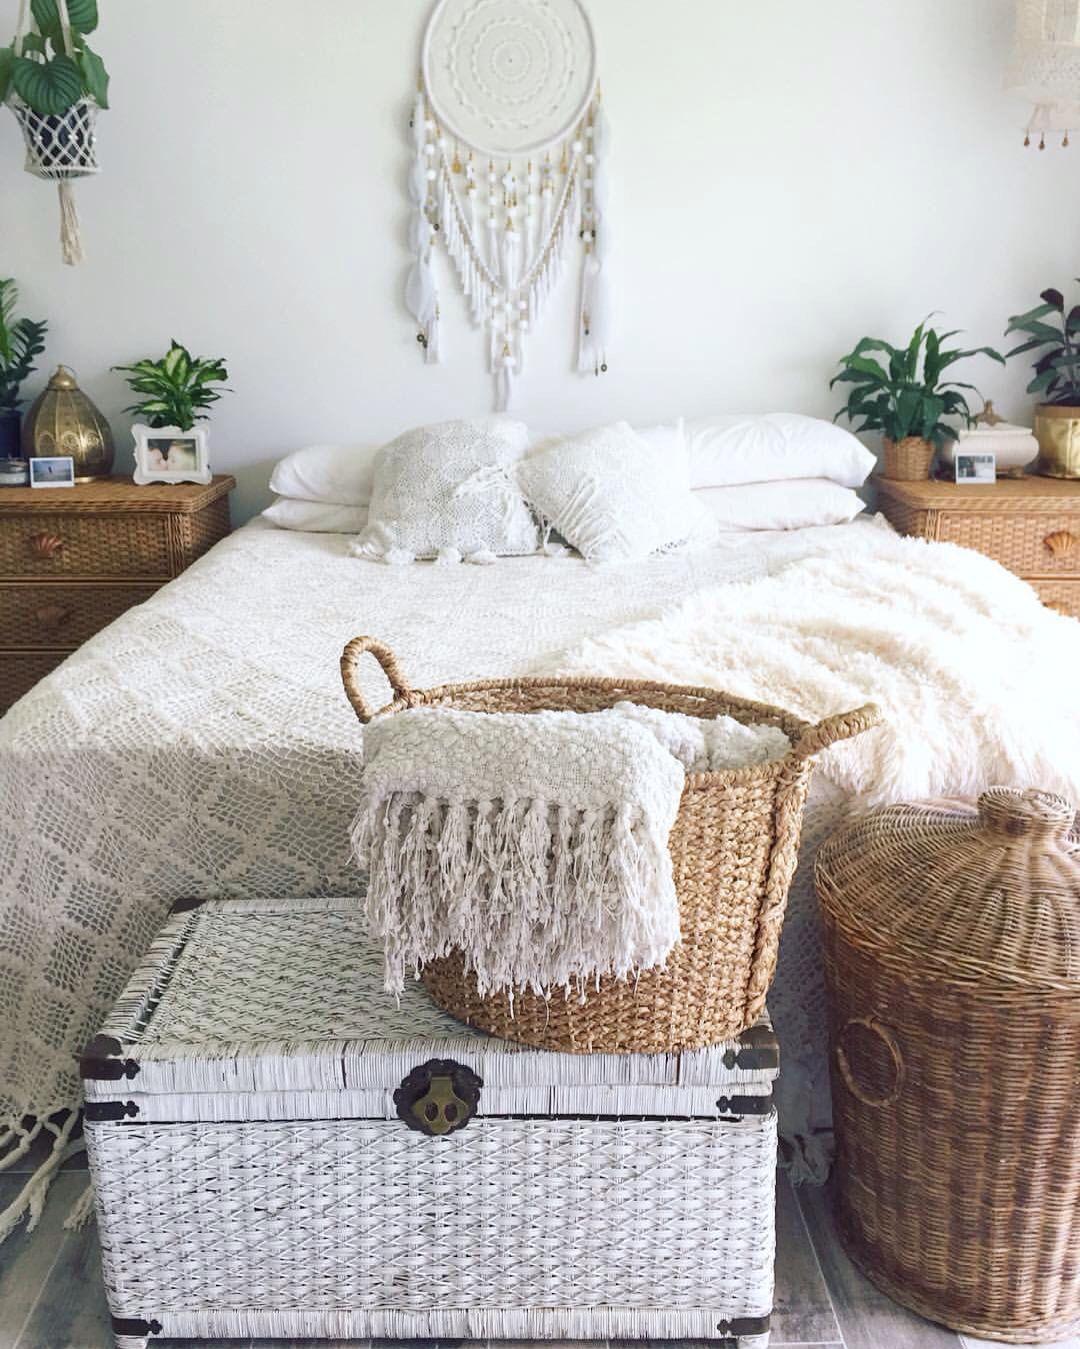 Ordinaire Home Renovation Bedroom Crochet Throw Basket Peace Lily Cane Furniture Boho  Bohemian Style Instagram: Sian____